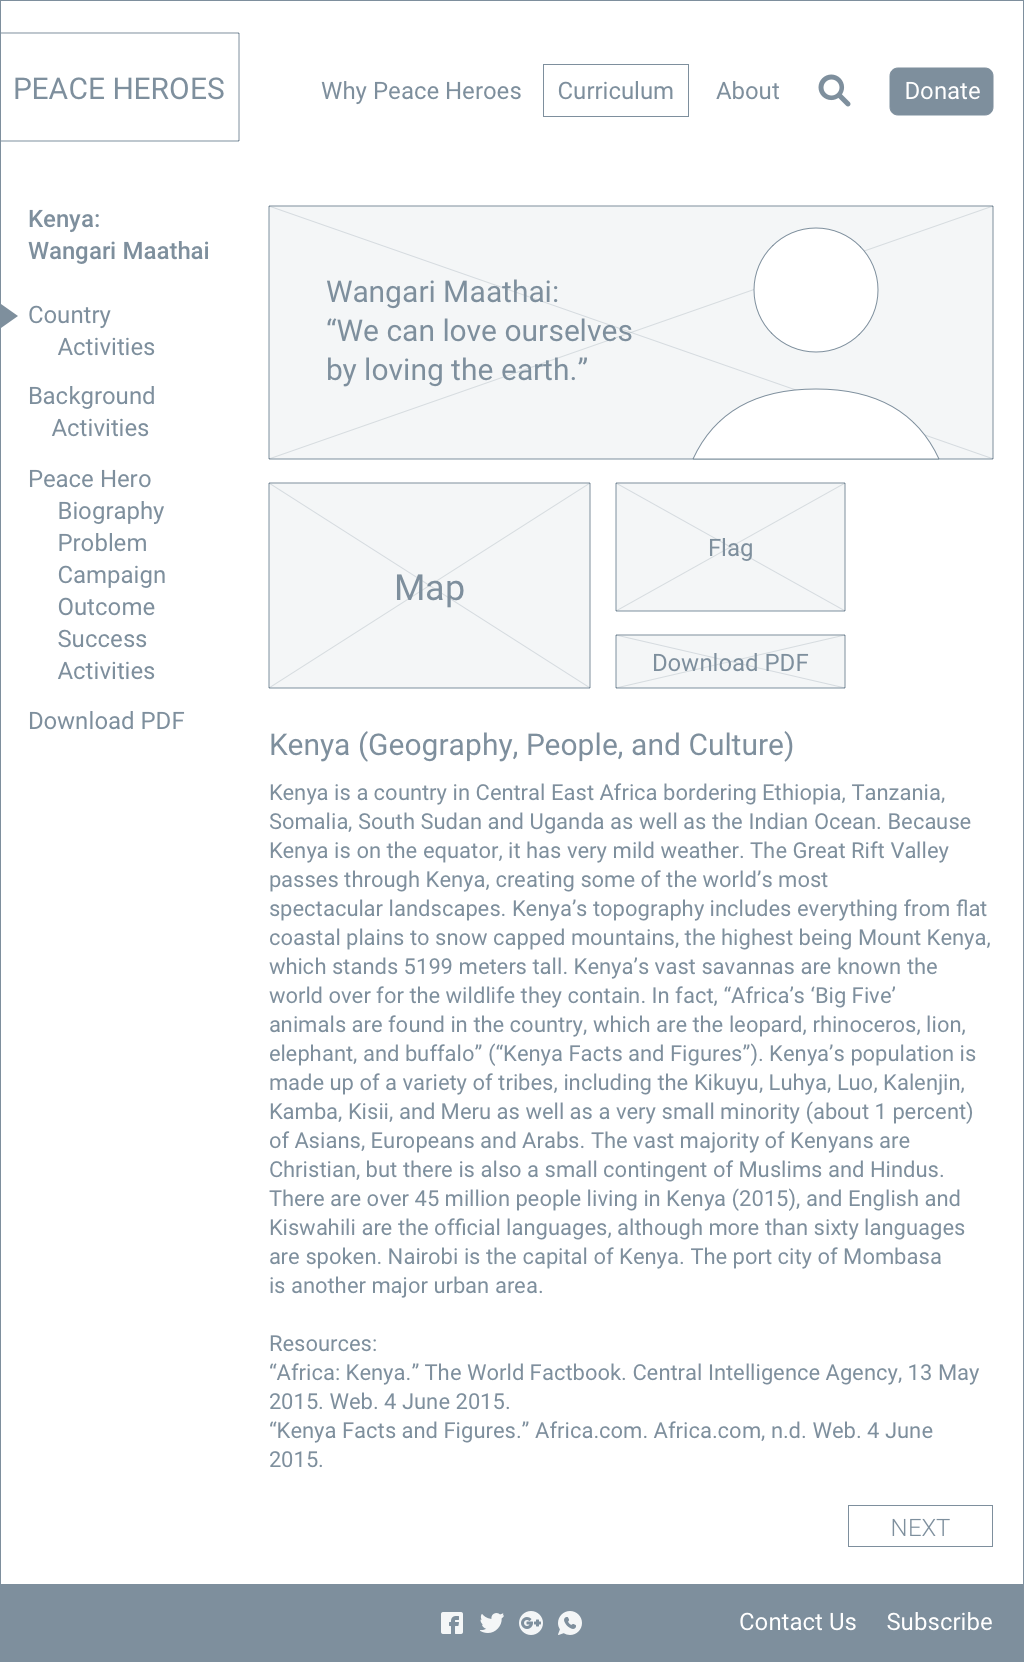 Curriculum landing page